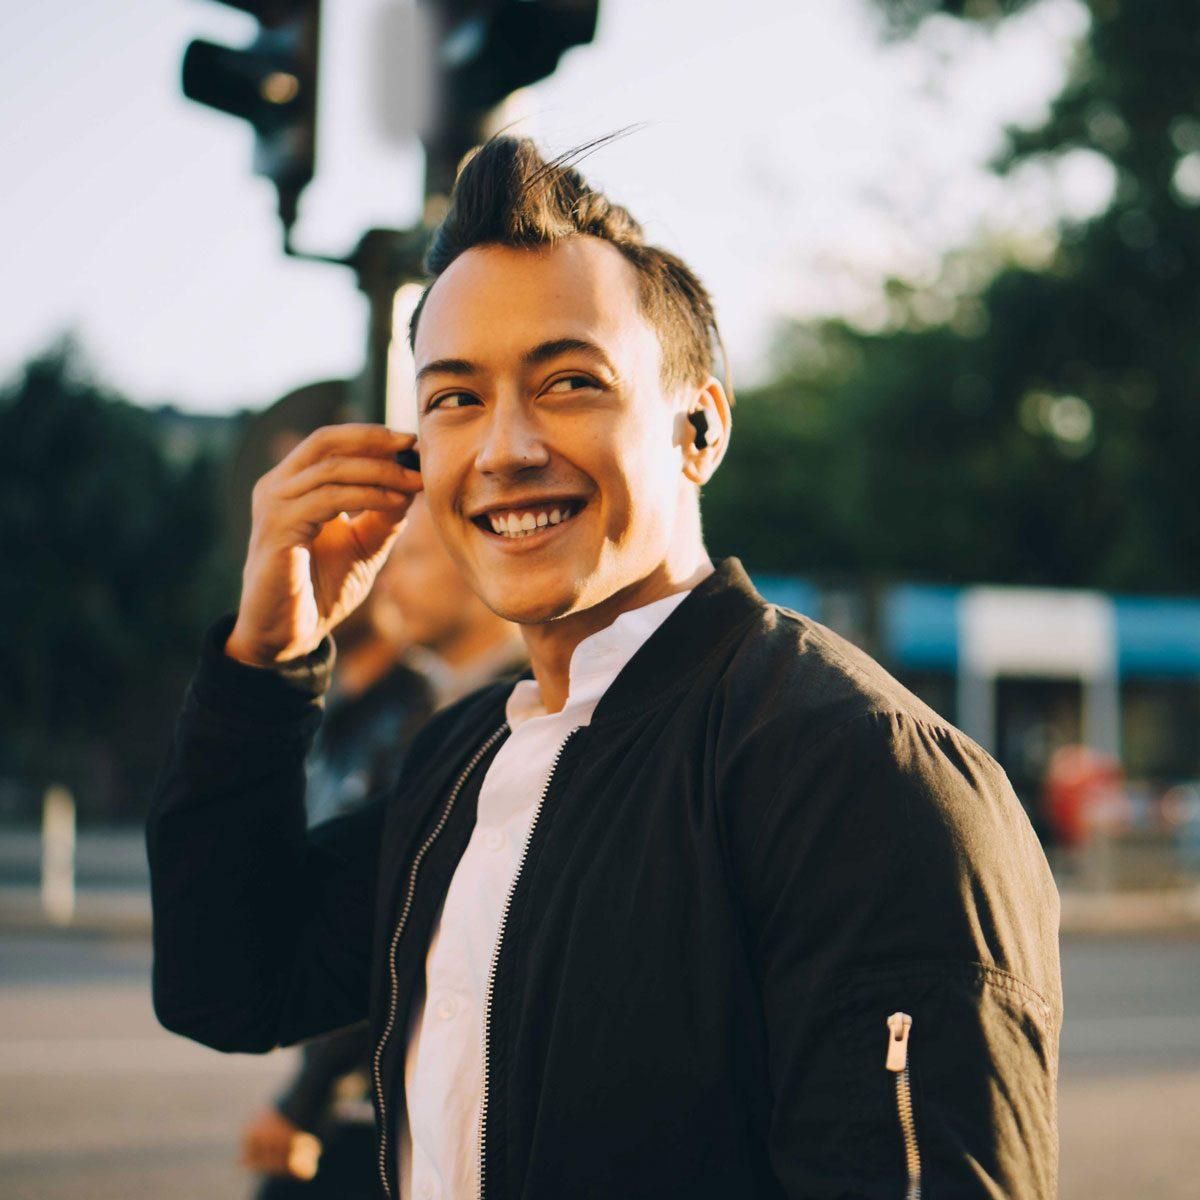 Man wearing wireless headphones